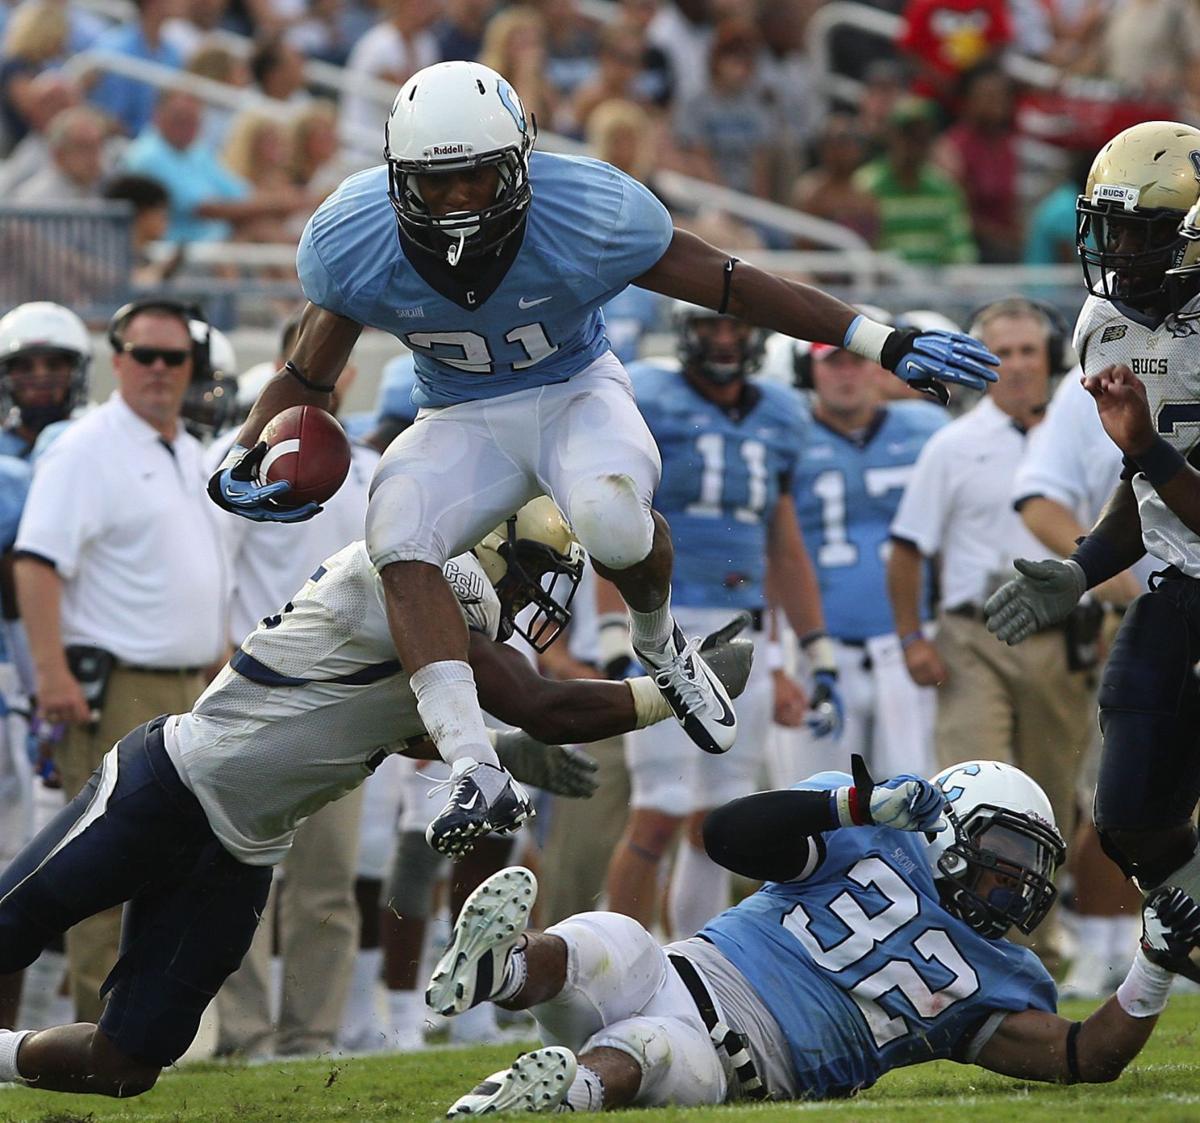 Citadel pulls away from Charleston Southern in season opener